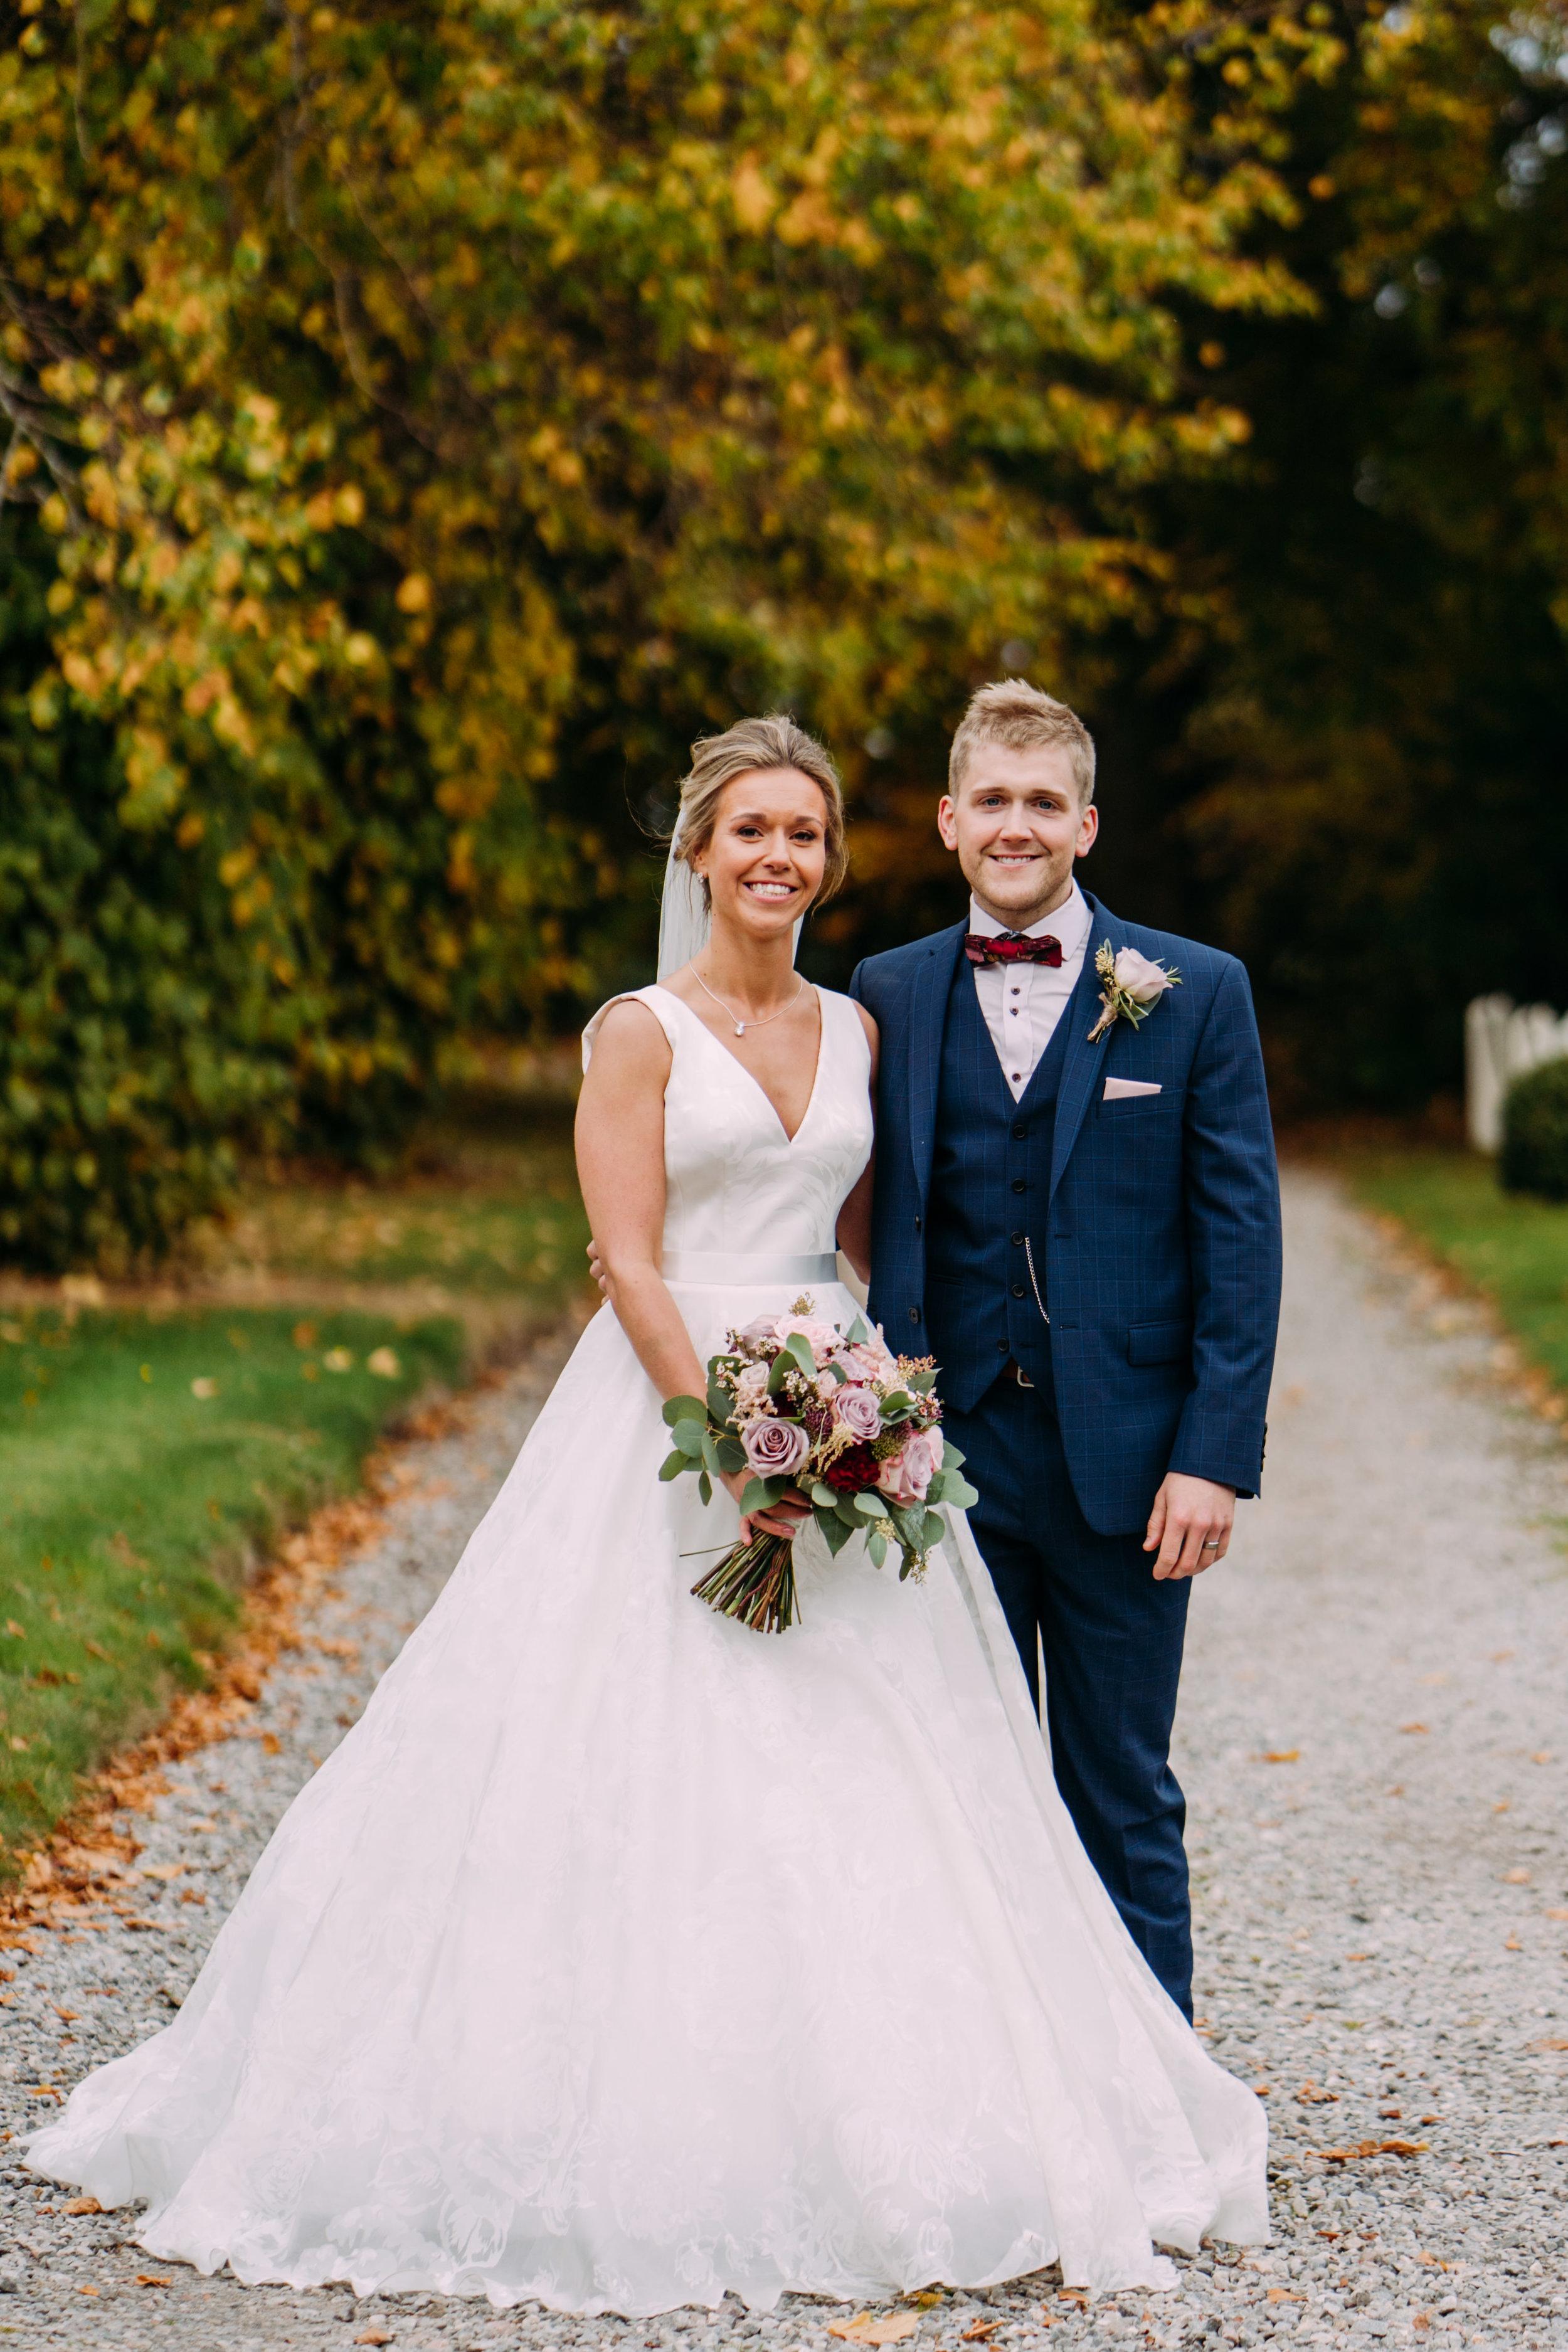 Karin_and_Shauns_Wedding_-_Achnagairn_Castle_-_www.eilidhrobertson.co.uk-820.jpg